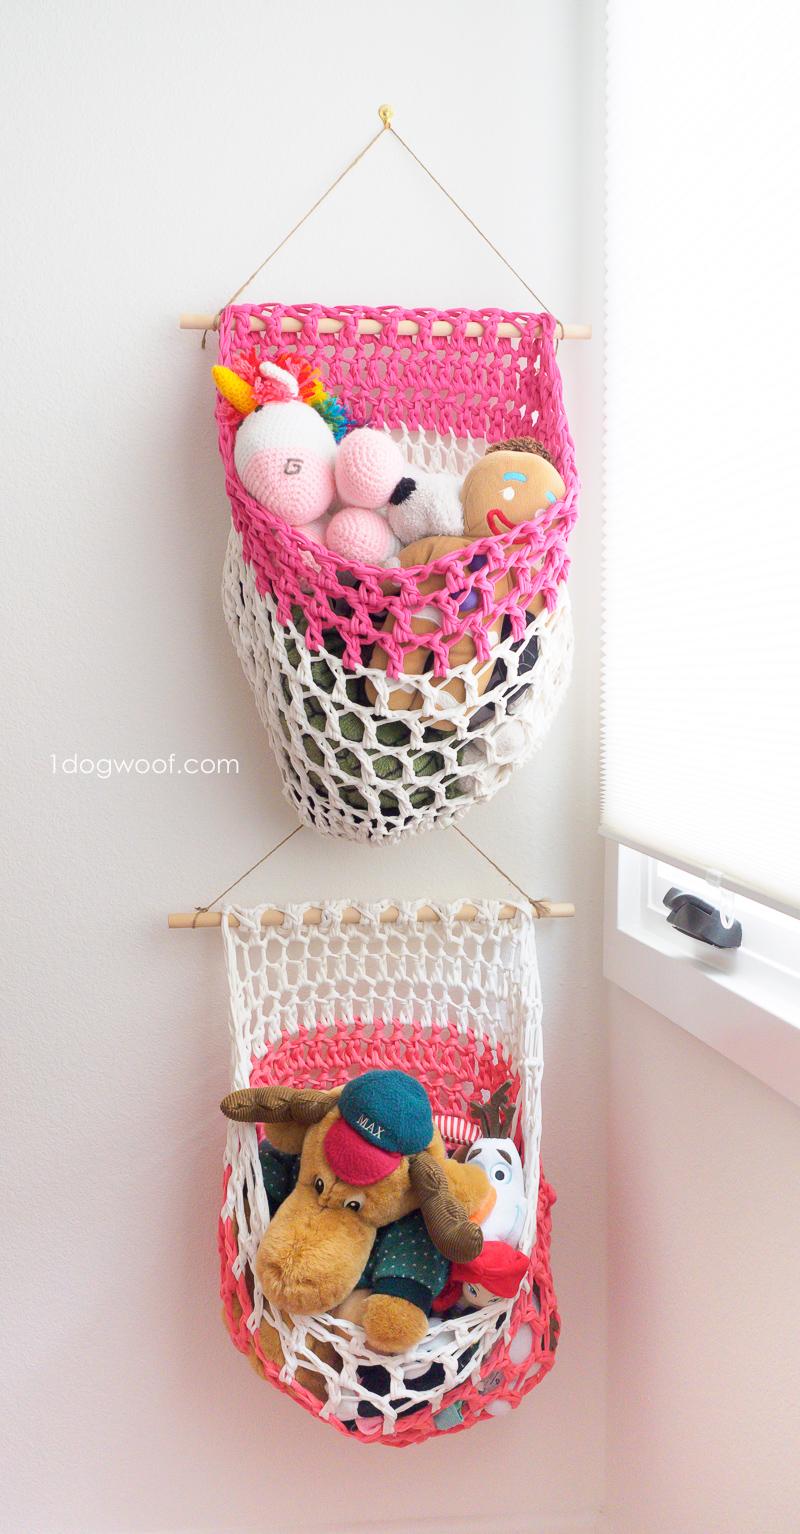 T-Shirt Yarn Hanging Basket Crochet Pattern - One Dog Woof